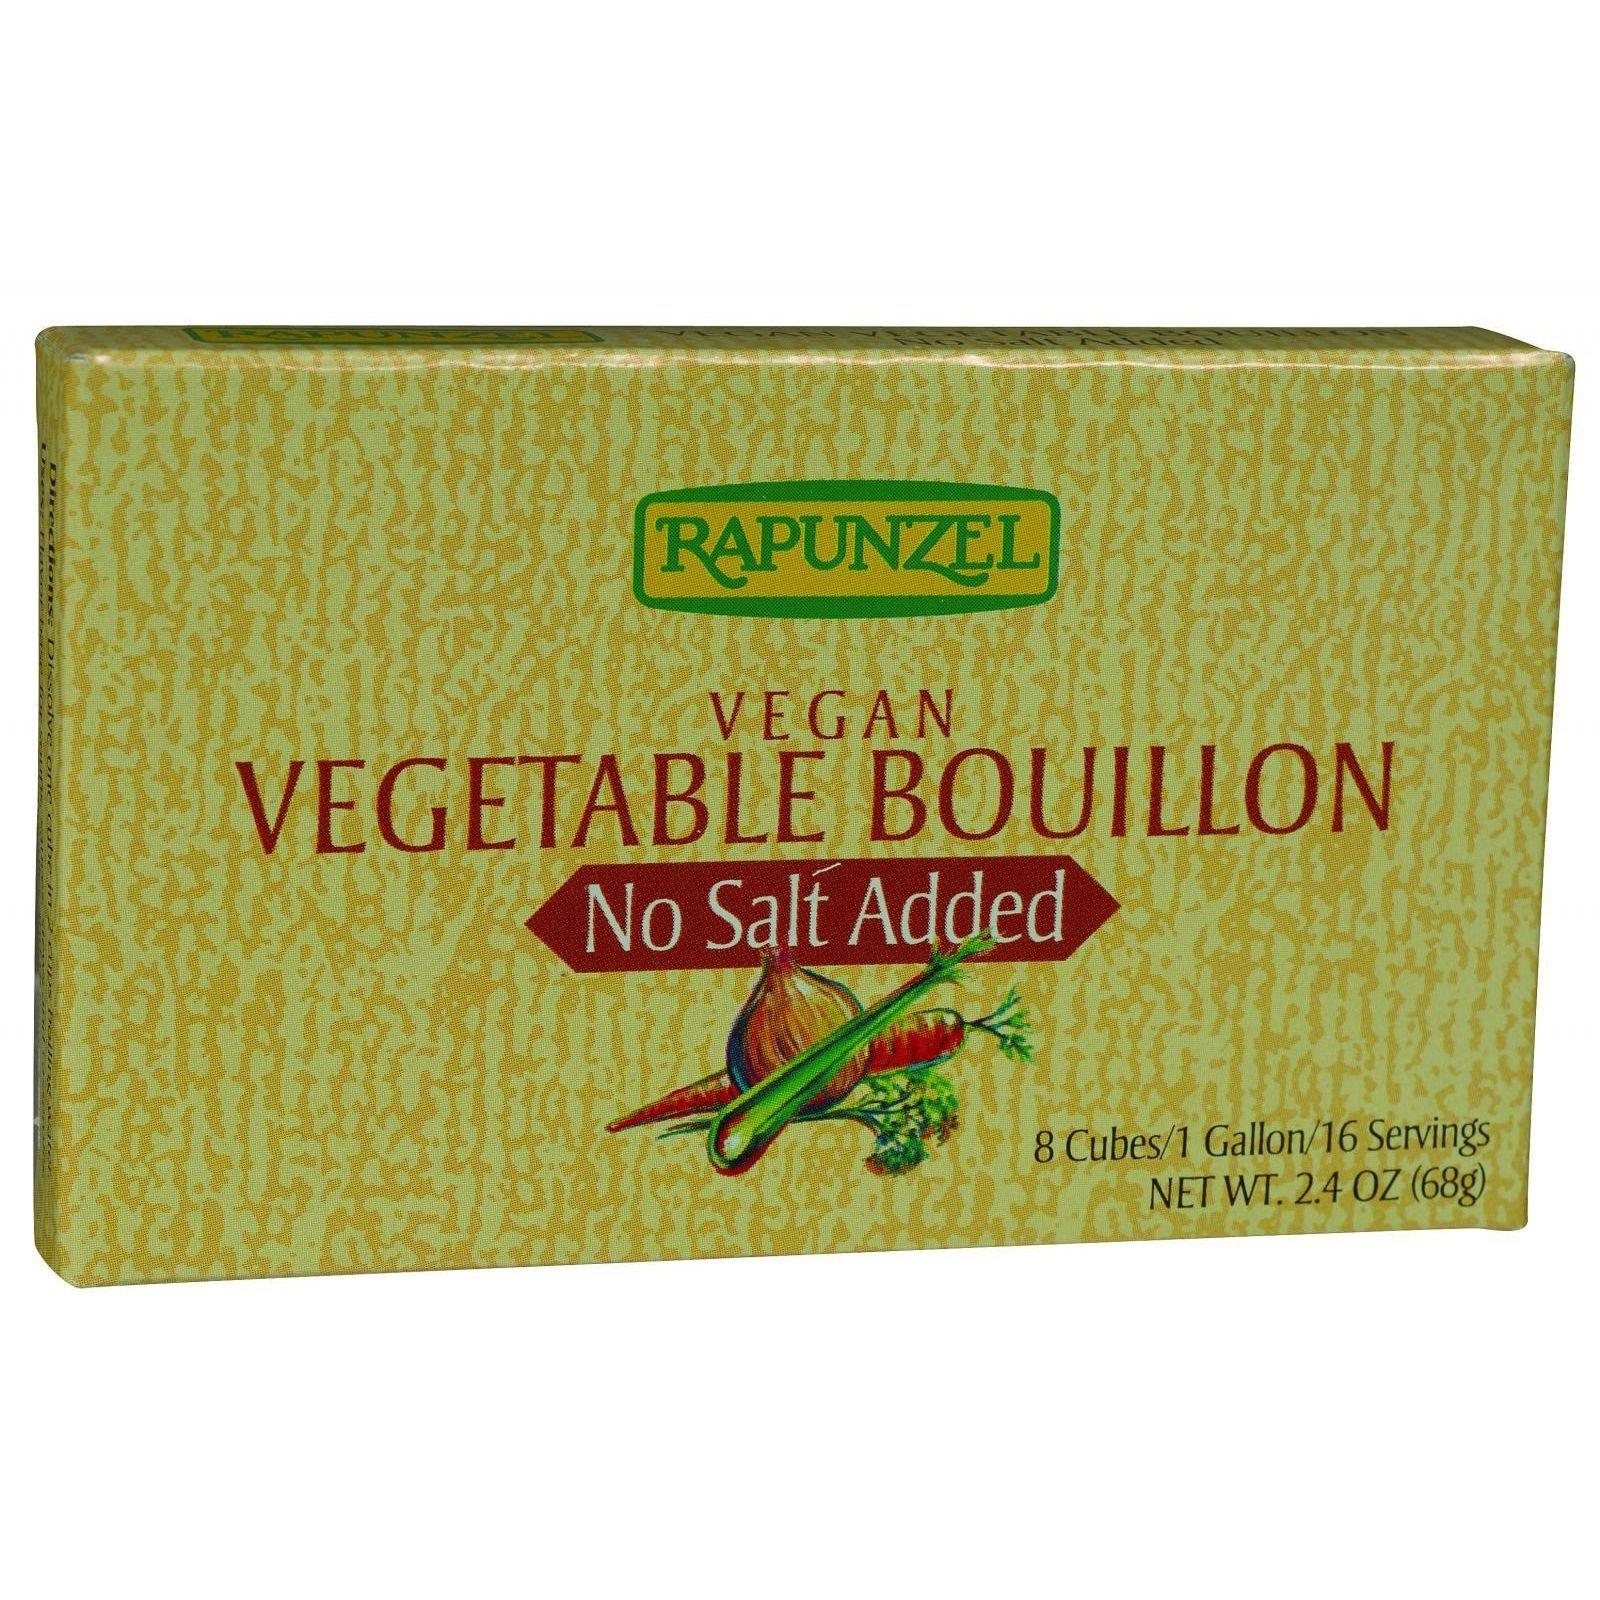 Rapunzel Bouillon Cubes - Vegetable - Vegan - No Salt Added - 2.4 oz - Case of 12 by Rapunzel